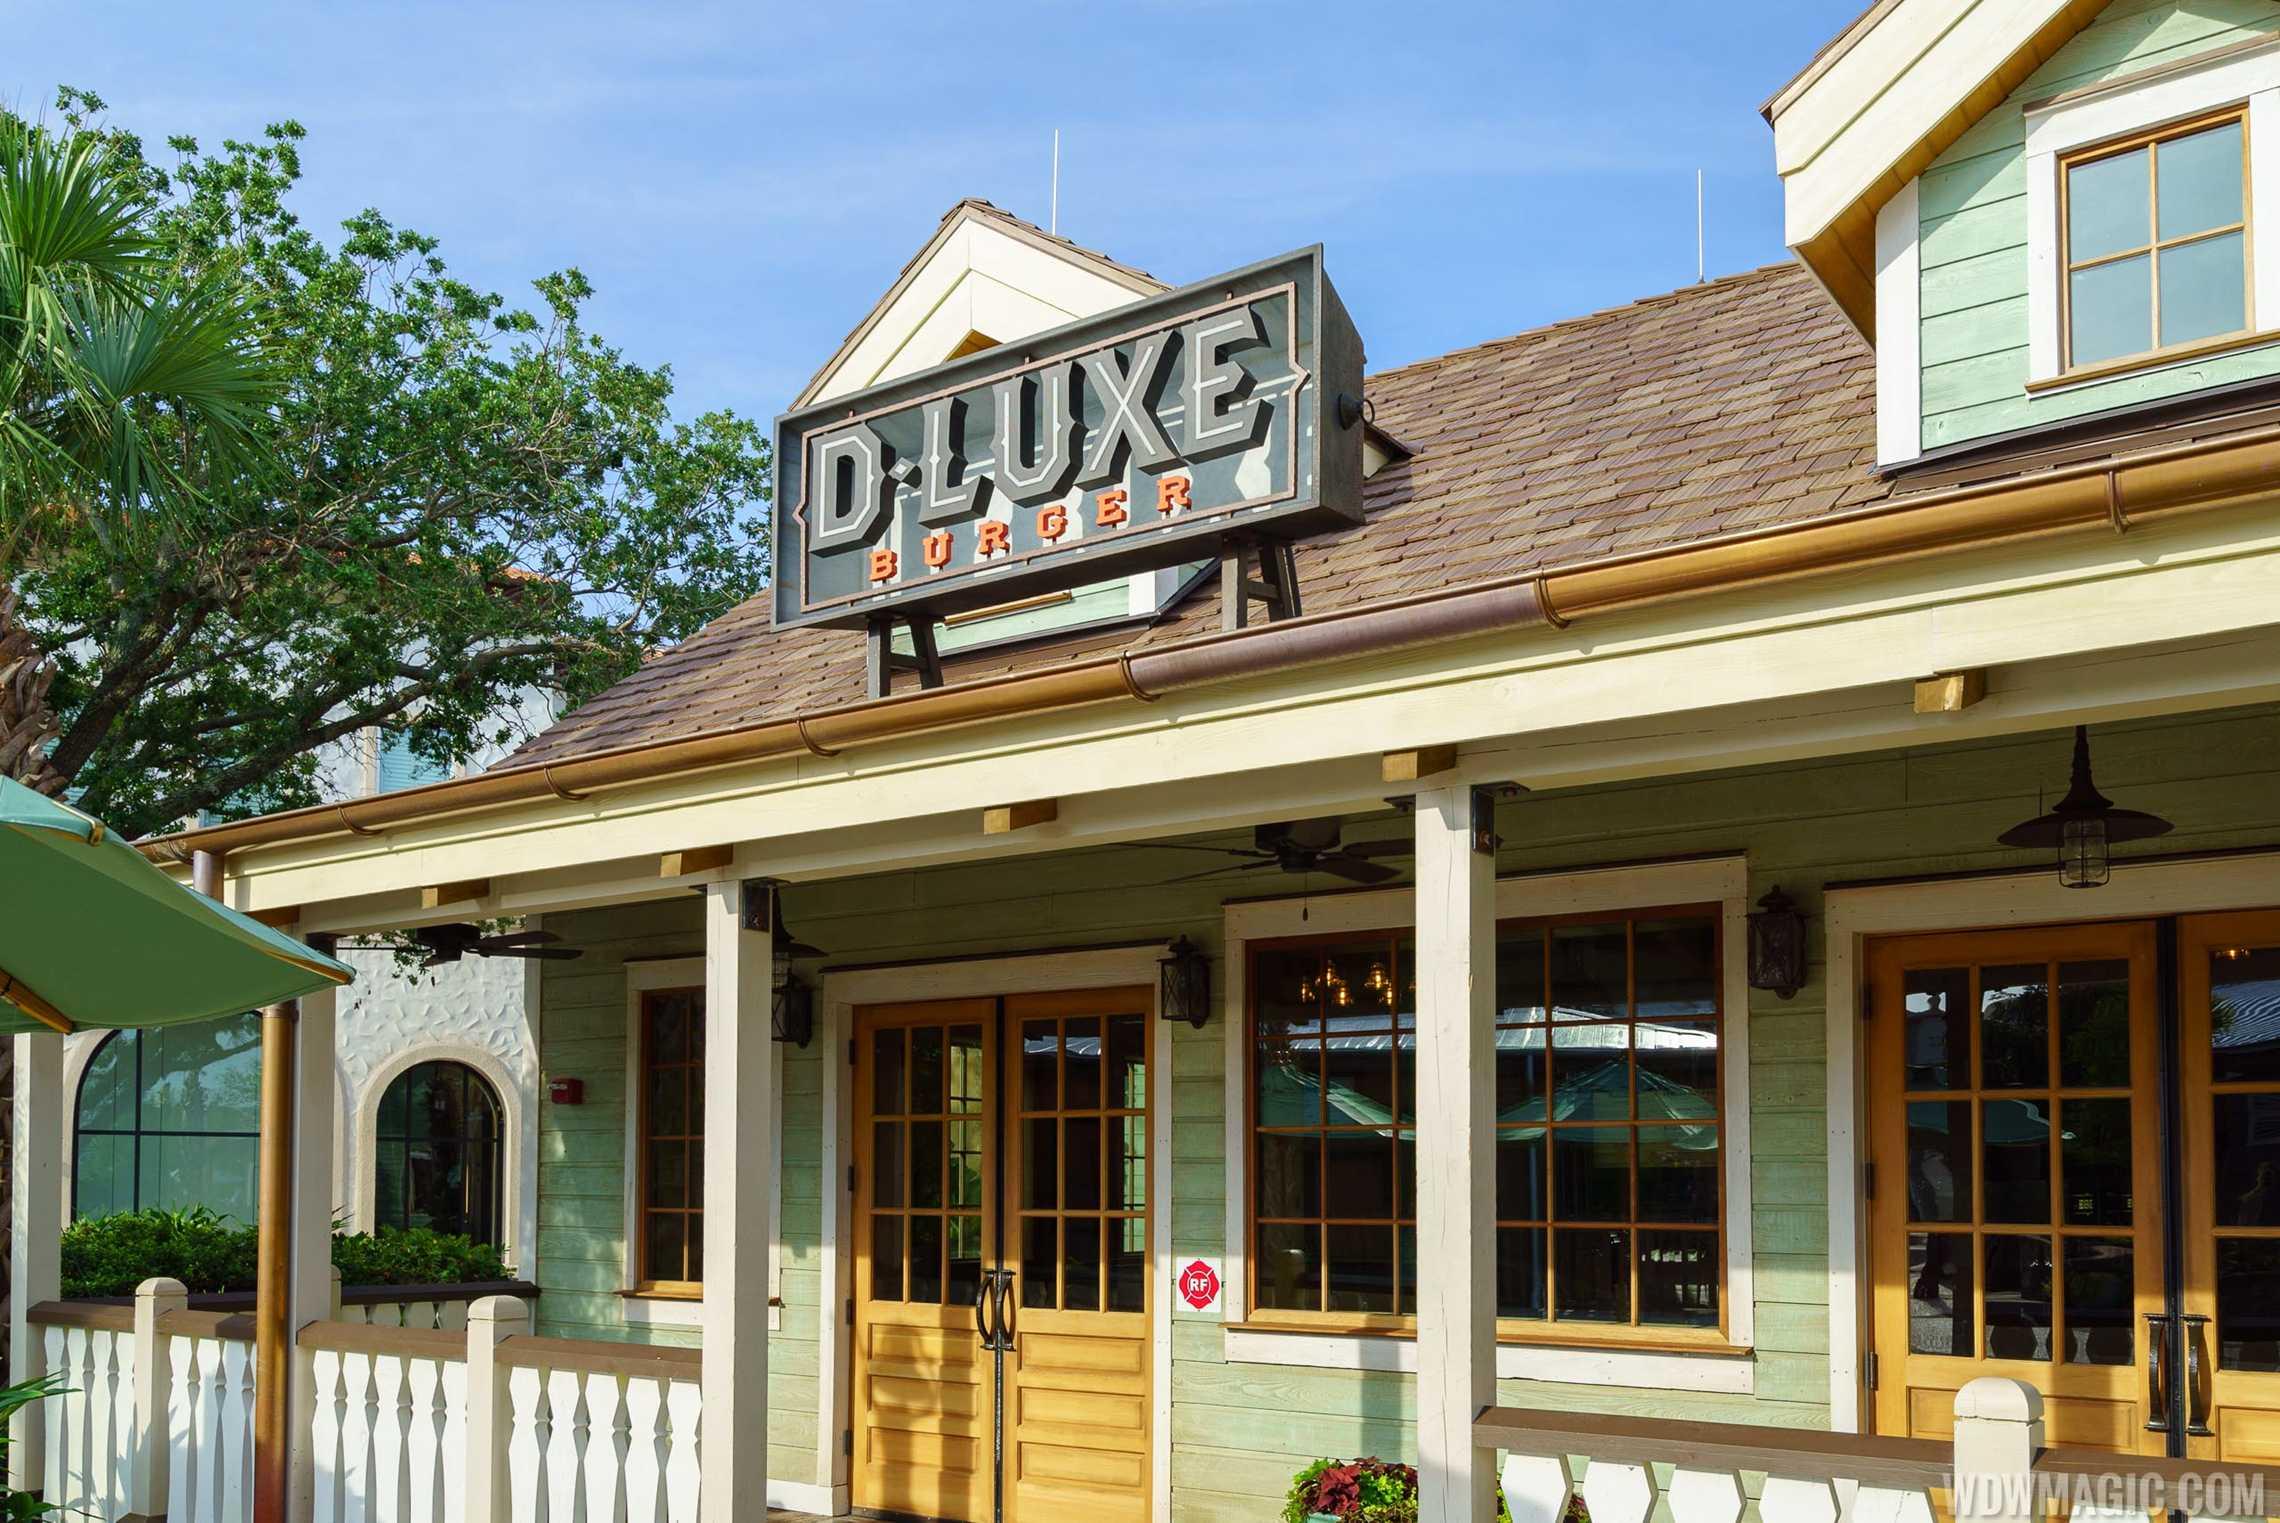 D-Luxe Burger - Entrance